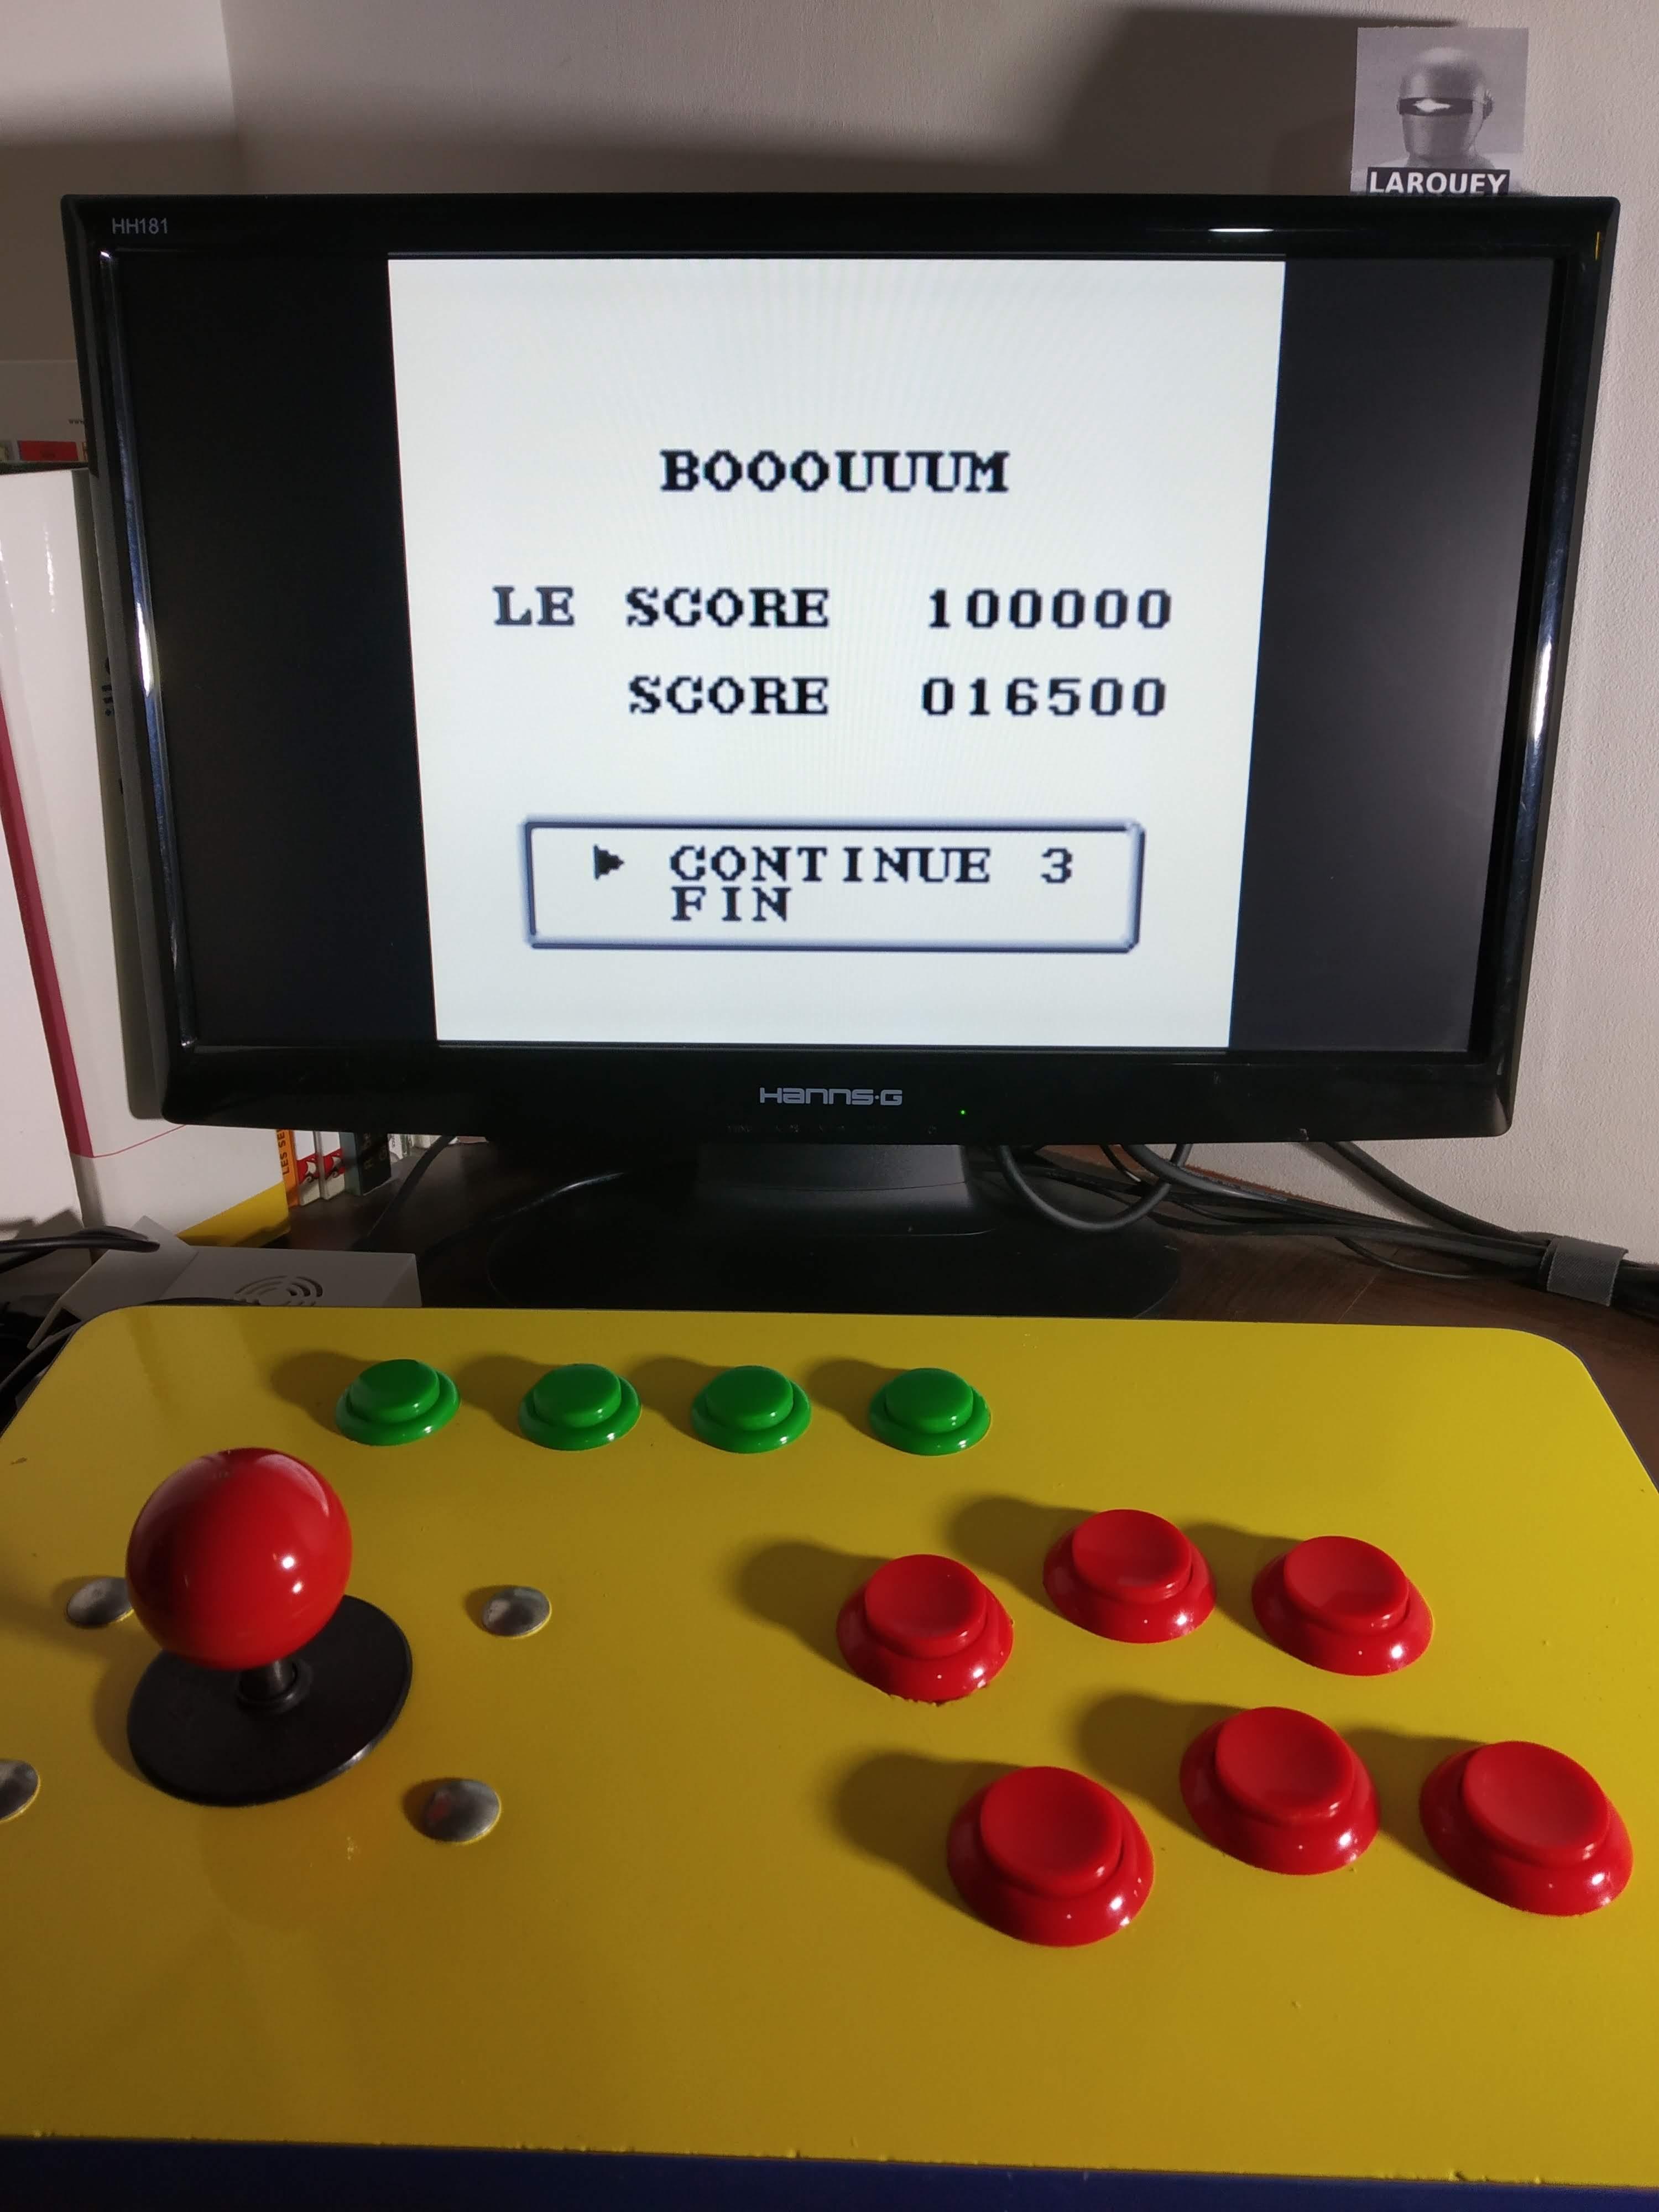 Larquey: Chikyu Kaiho Gun ZAS [Hard] (Game Boy Emulated) 16,500 points on 2019-12-02 07:54:23